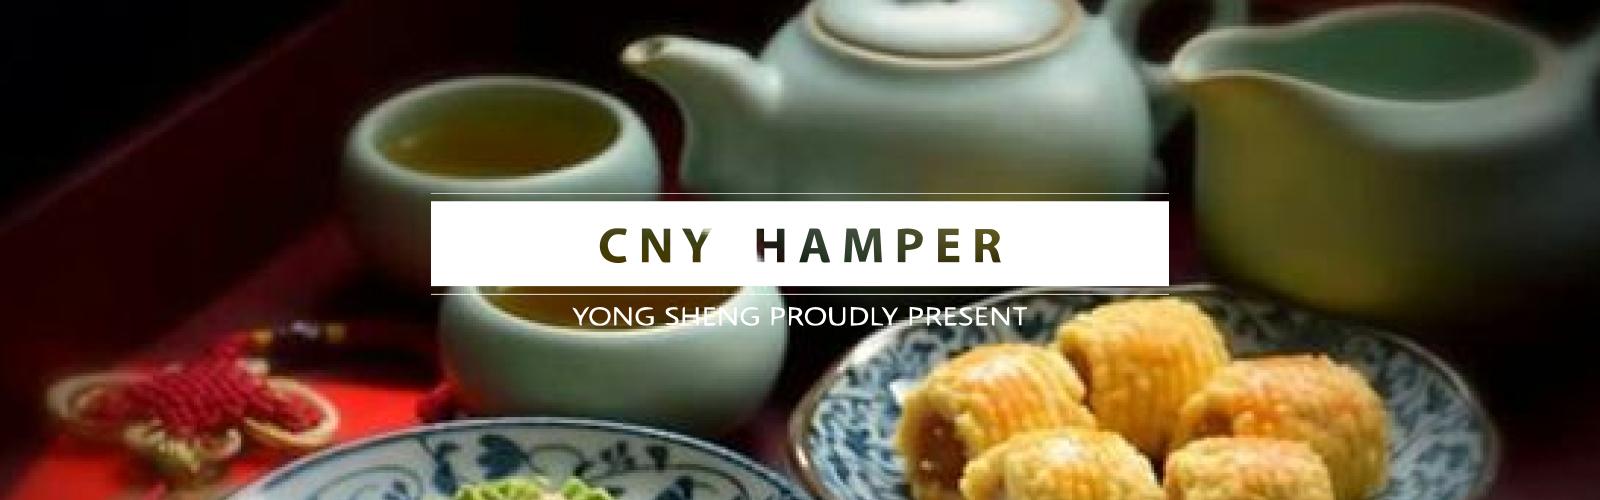 CNY hamper banner